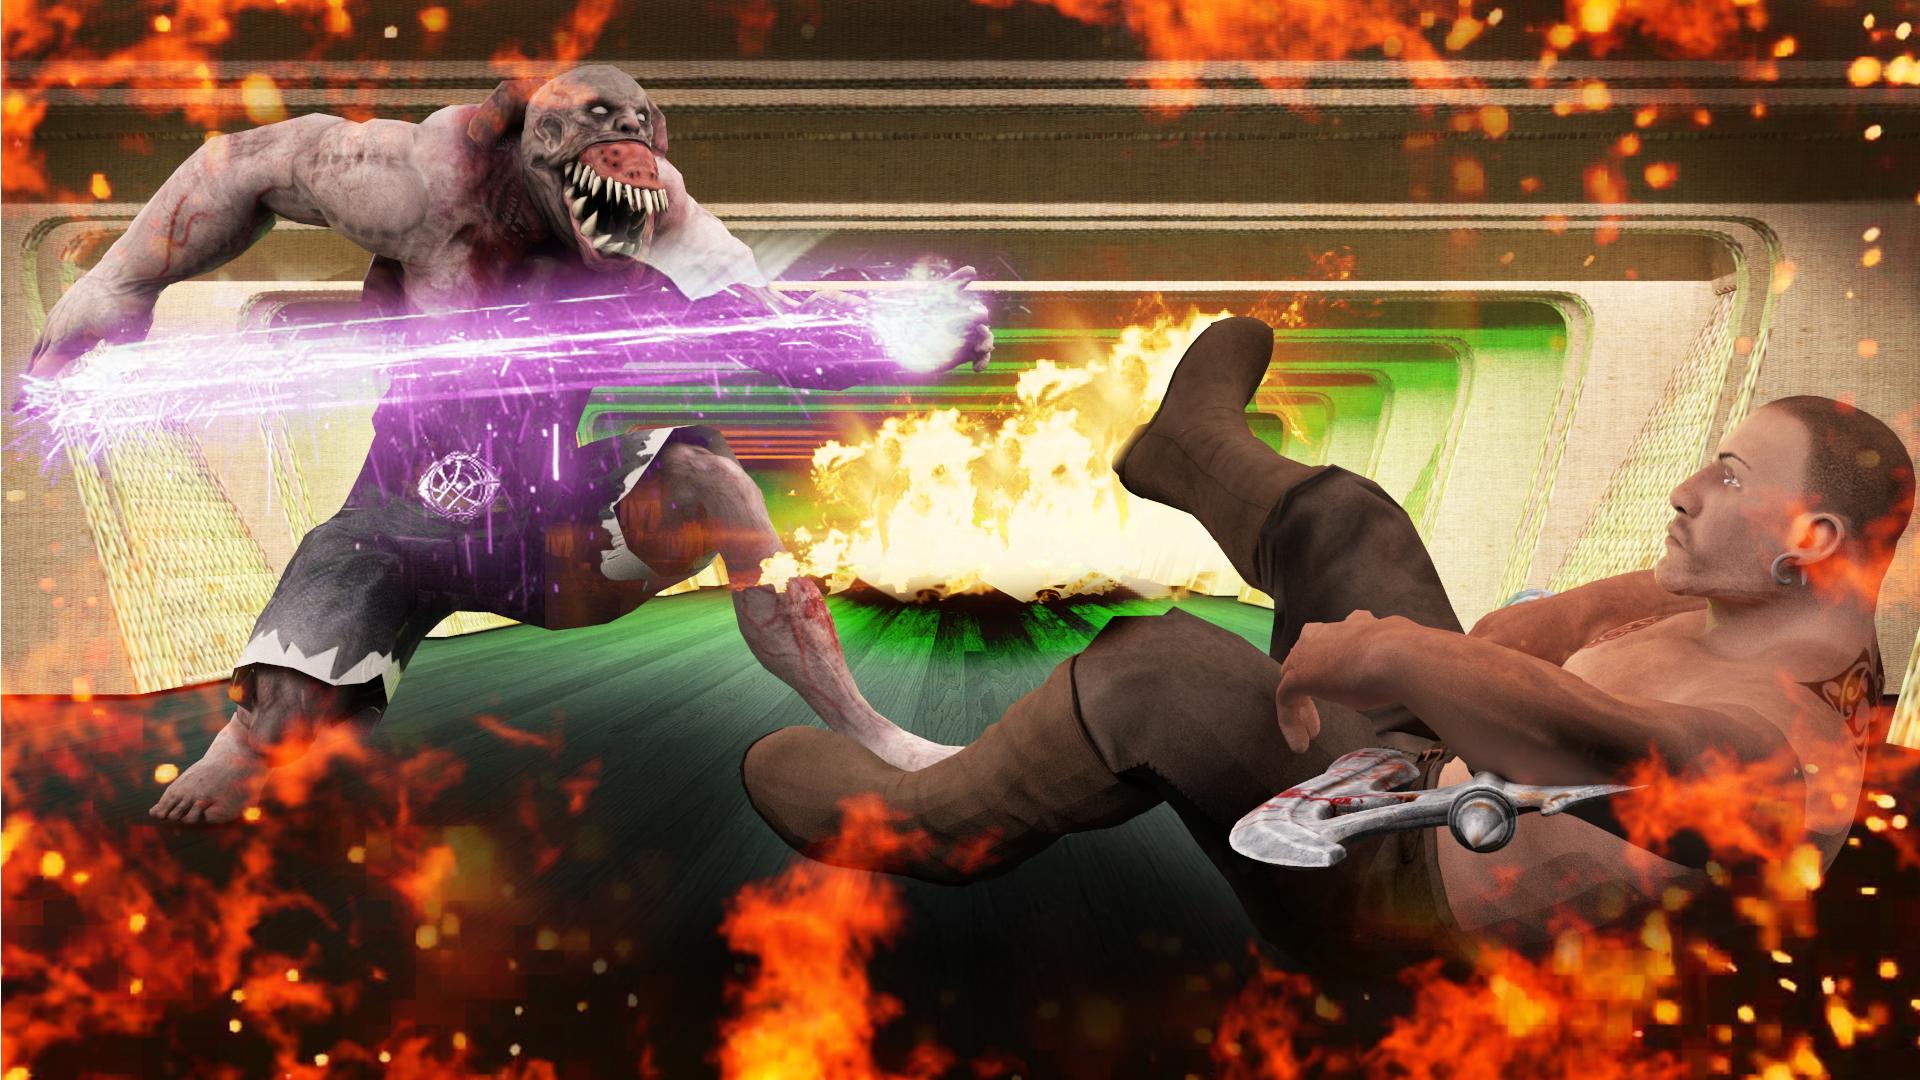 Incredible Monster Fighter vs Superhero Warrior